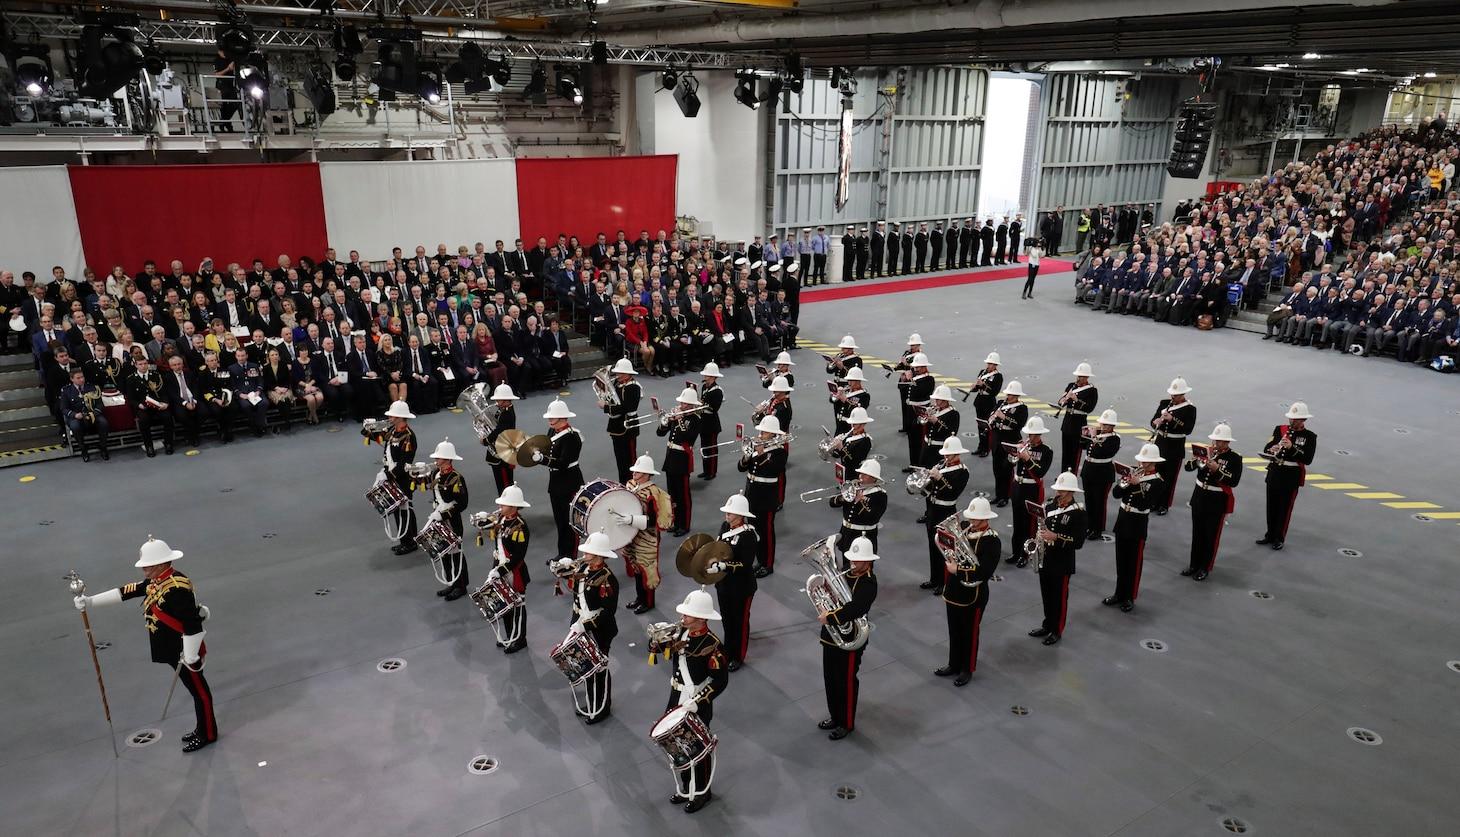 U.S. Sixth Fleet Commander Witnesses HMS Prince of Wales Commissioning